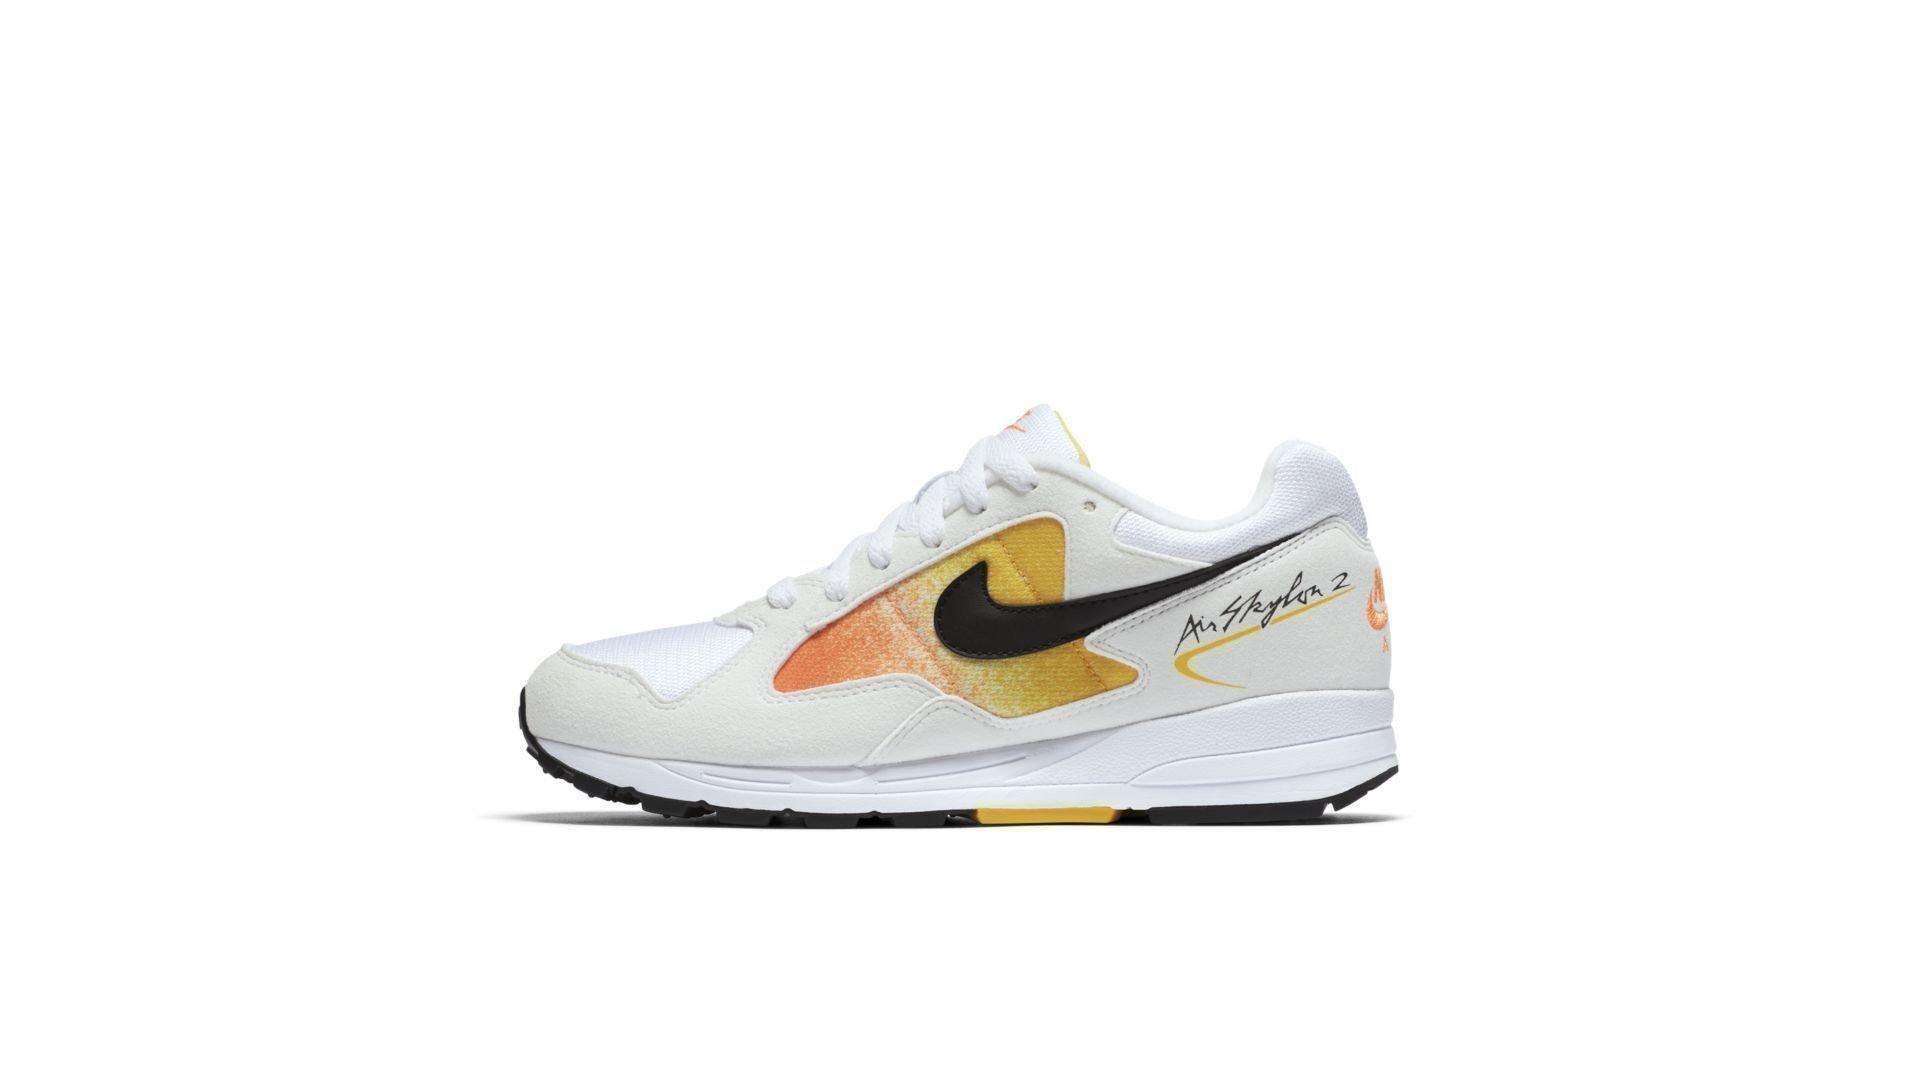 Nike WMNS Air Skylon II 'White/Yellow (AO4540-101)